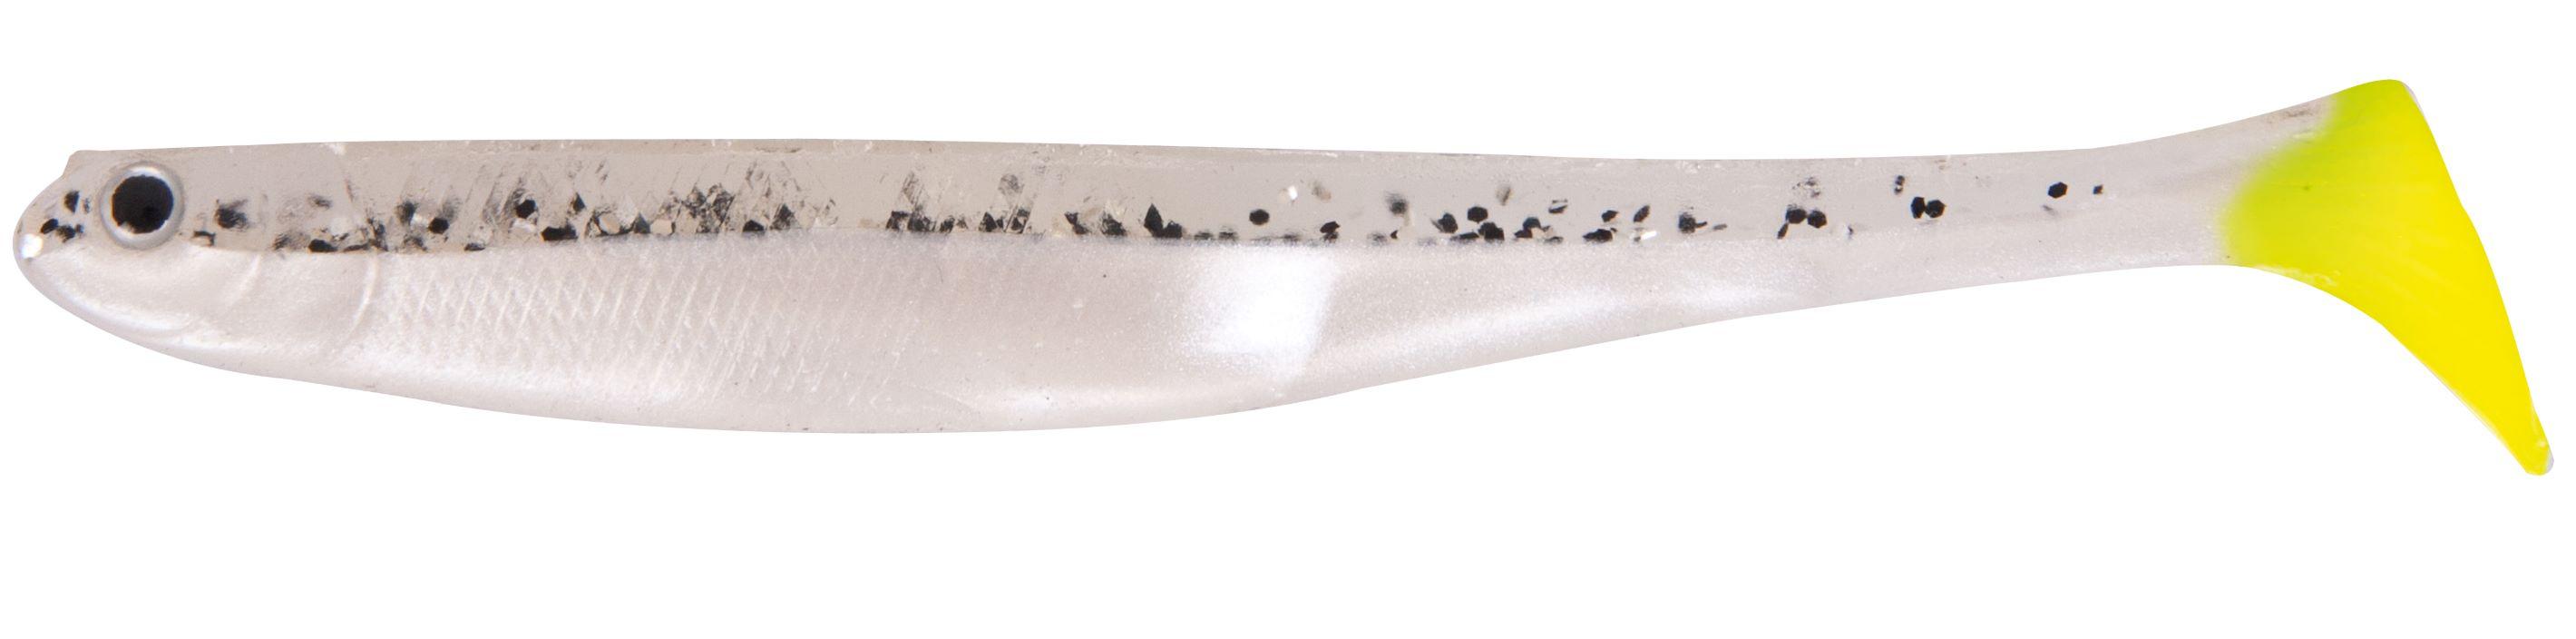 Iron Claw gumová nástraha Slim Jim 13 cm Vzor CT, 3ks